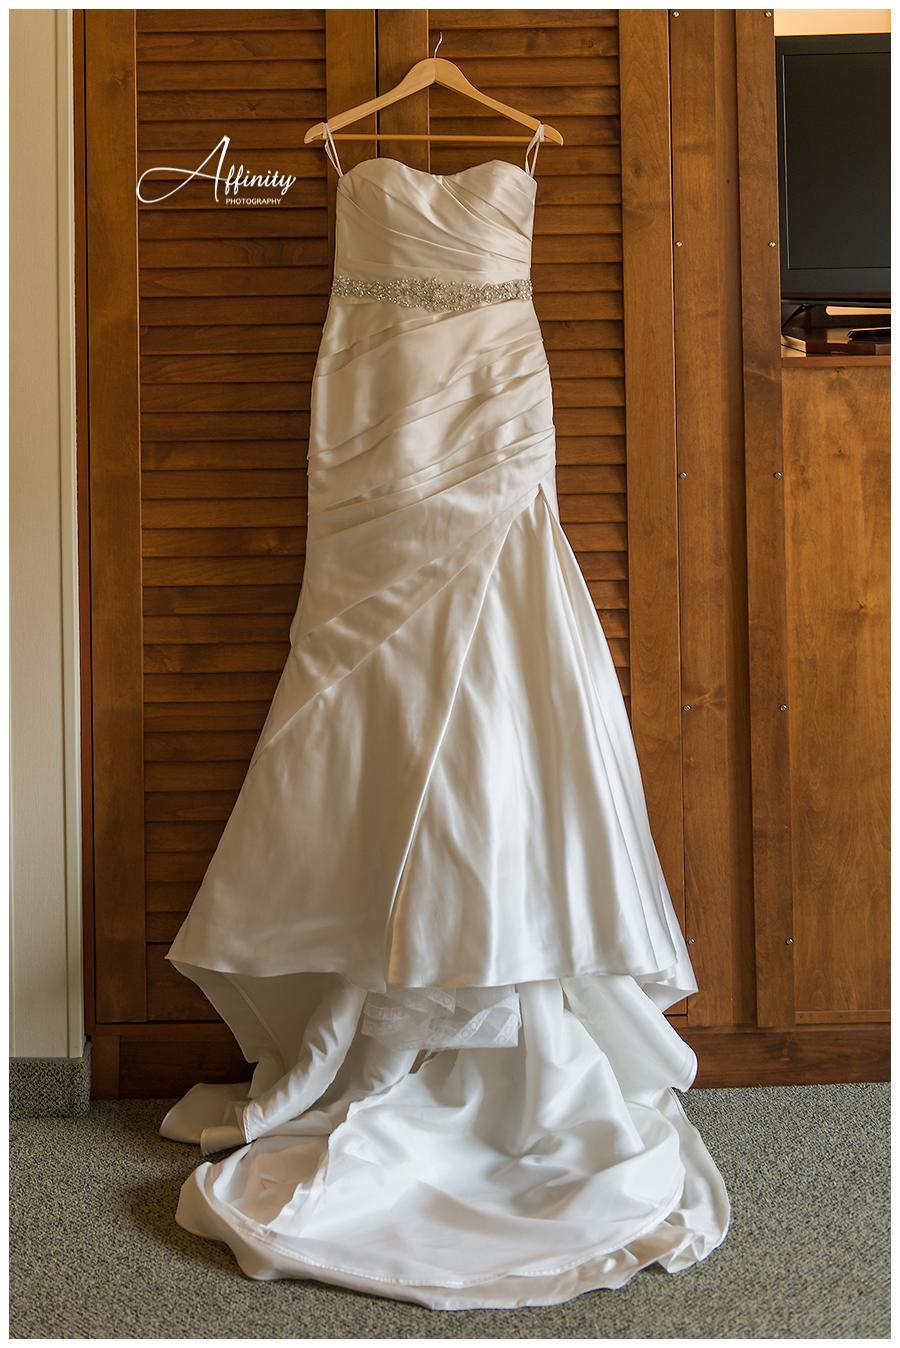 02-wedding-dress.jpg